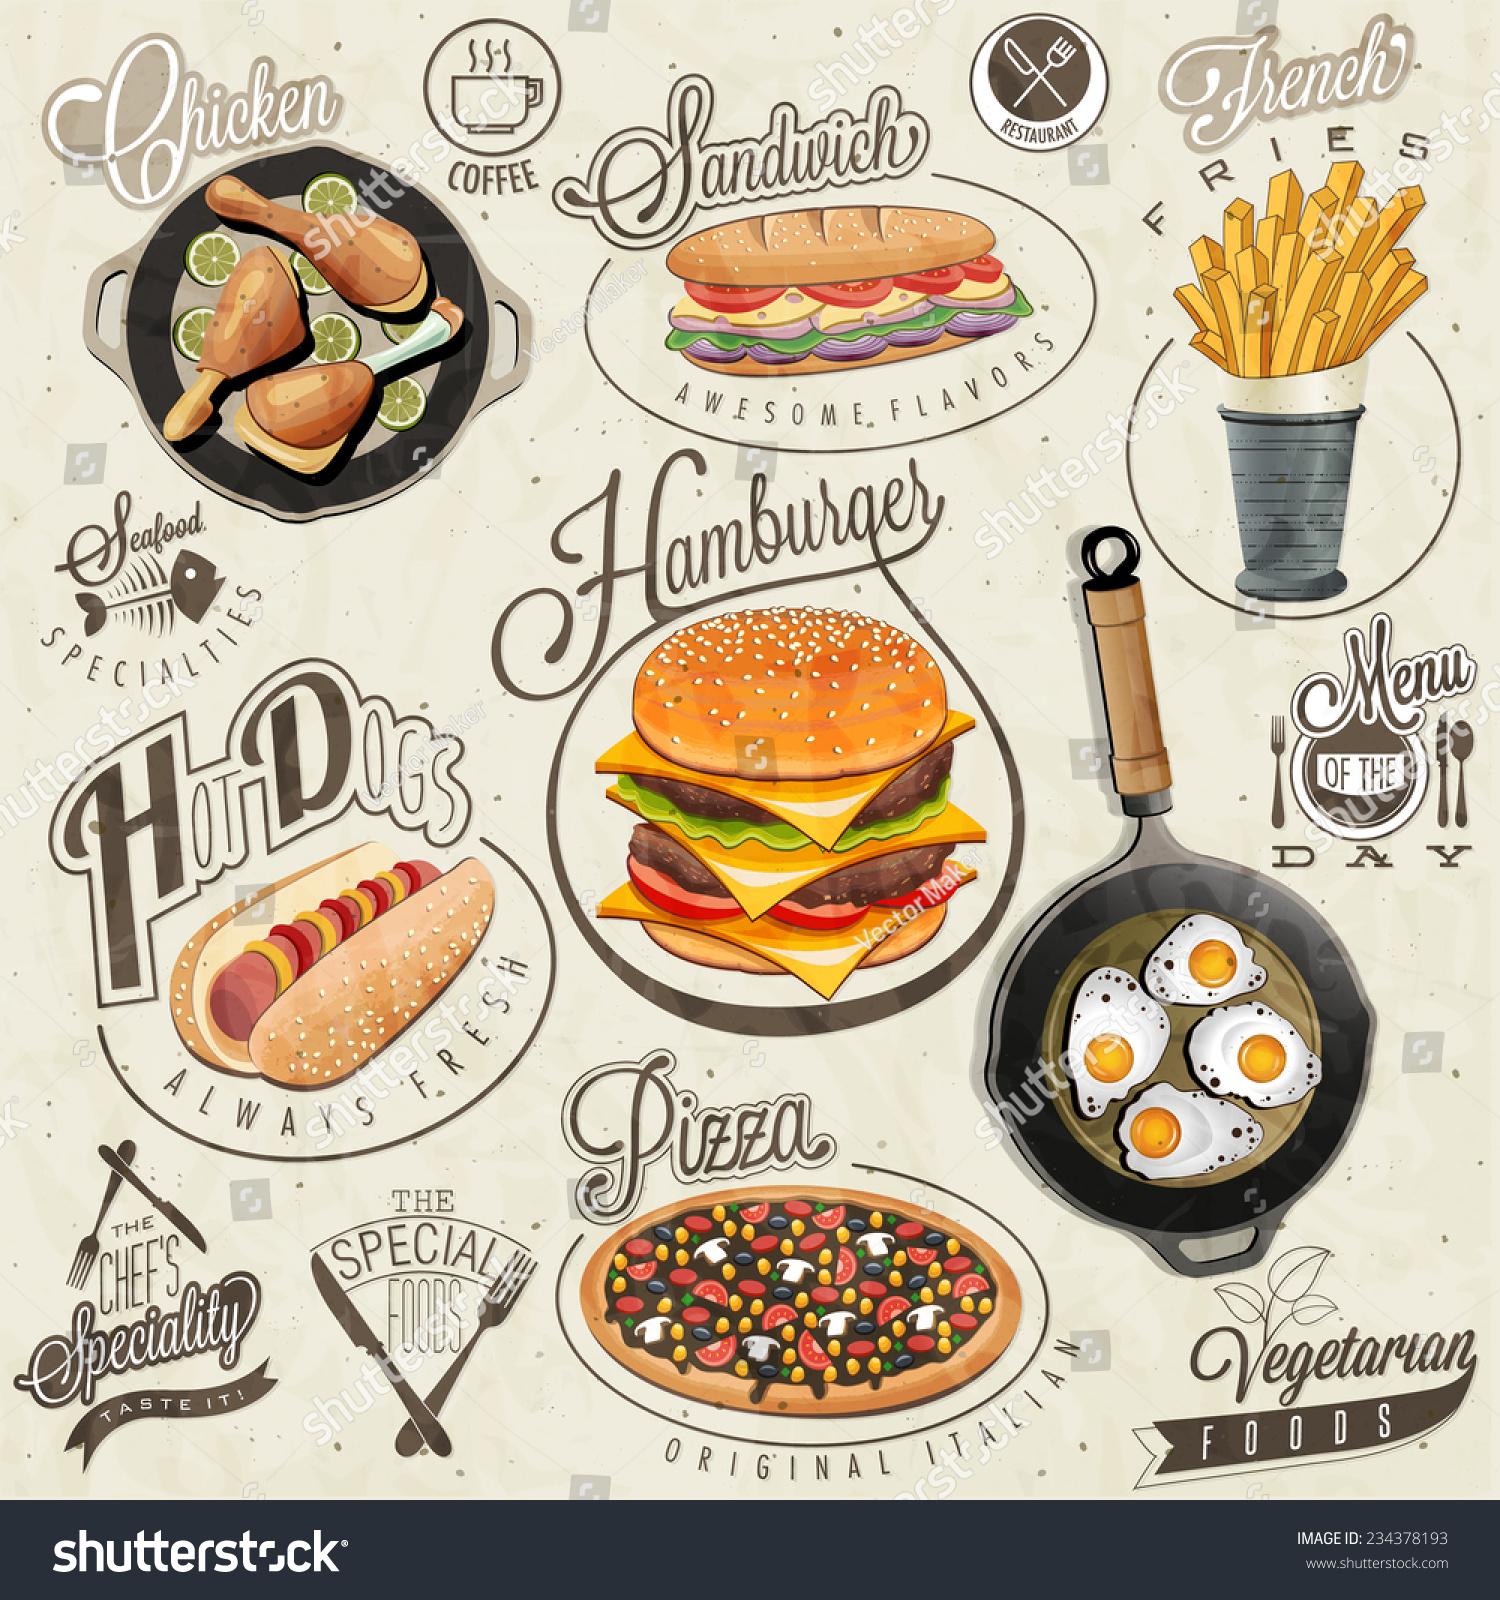 Royalty Free Retro Vintage Style Fast Food Designs 234378193